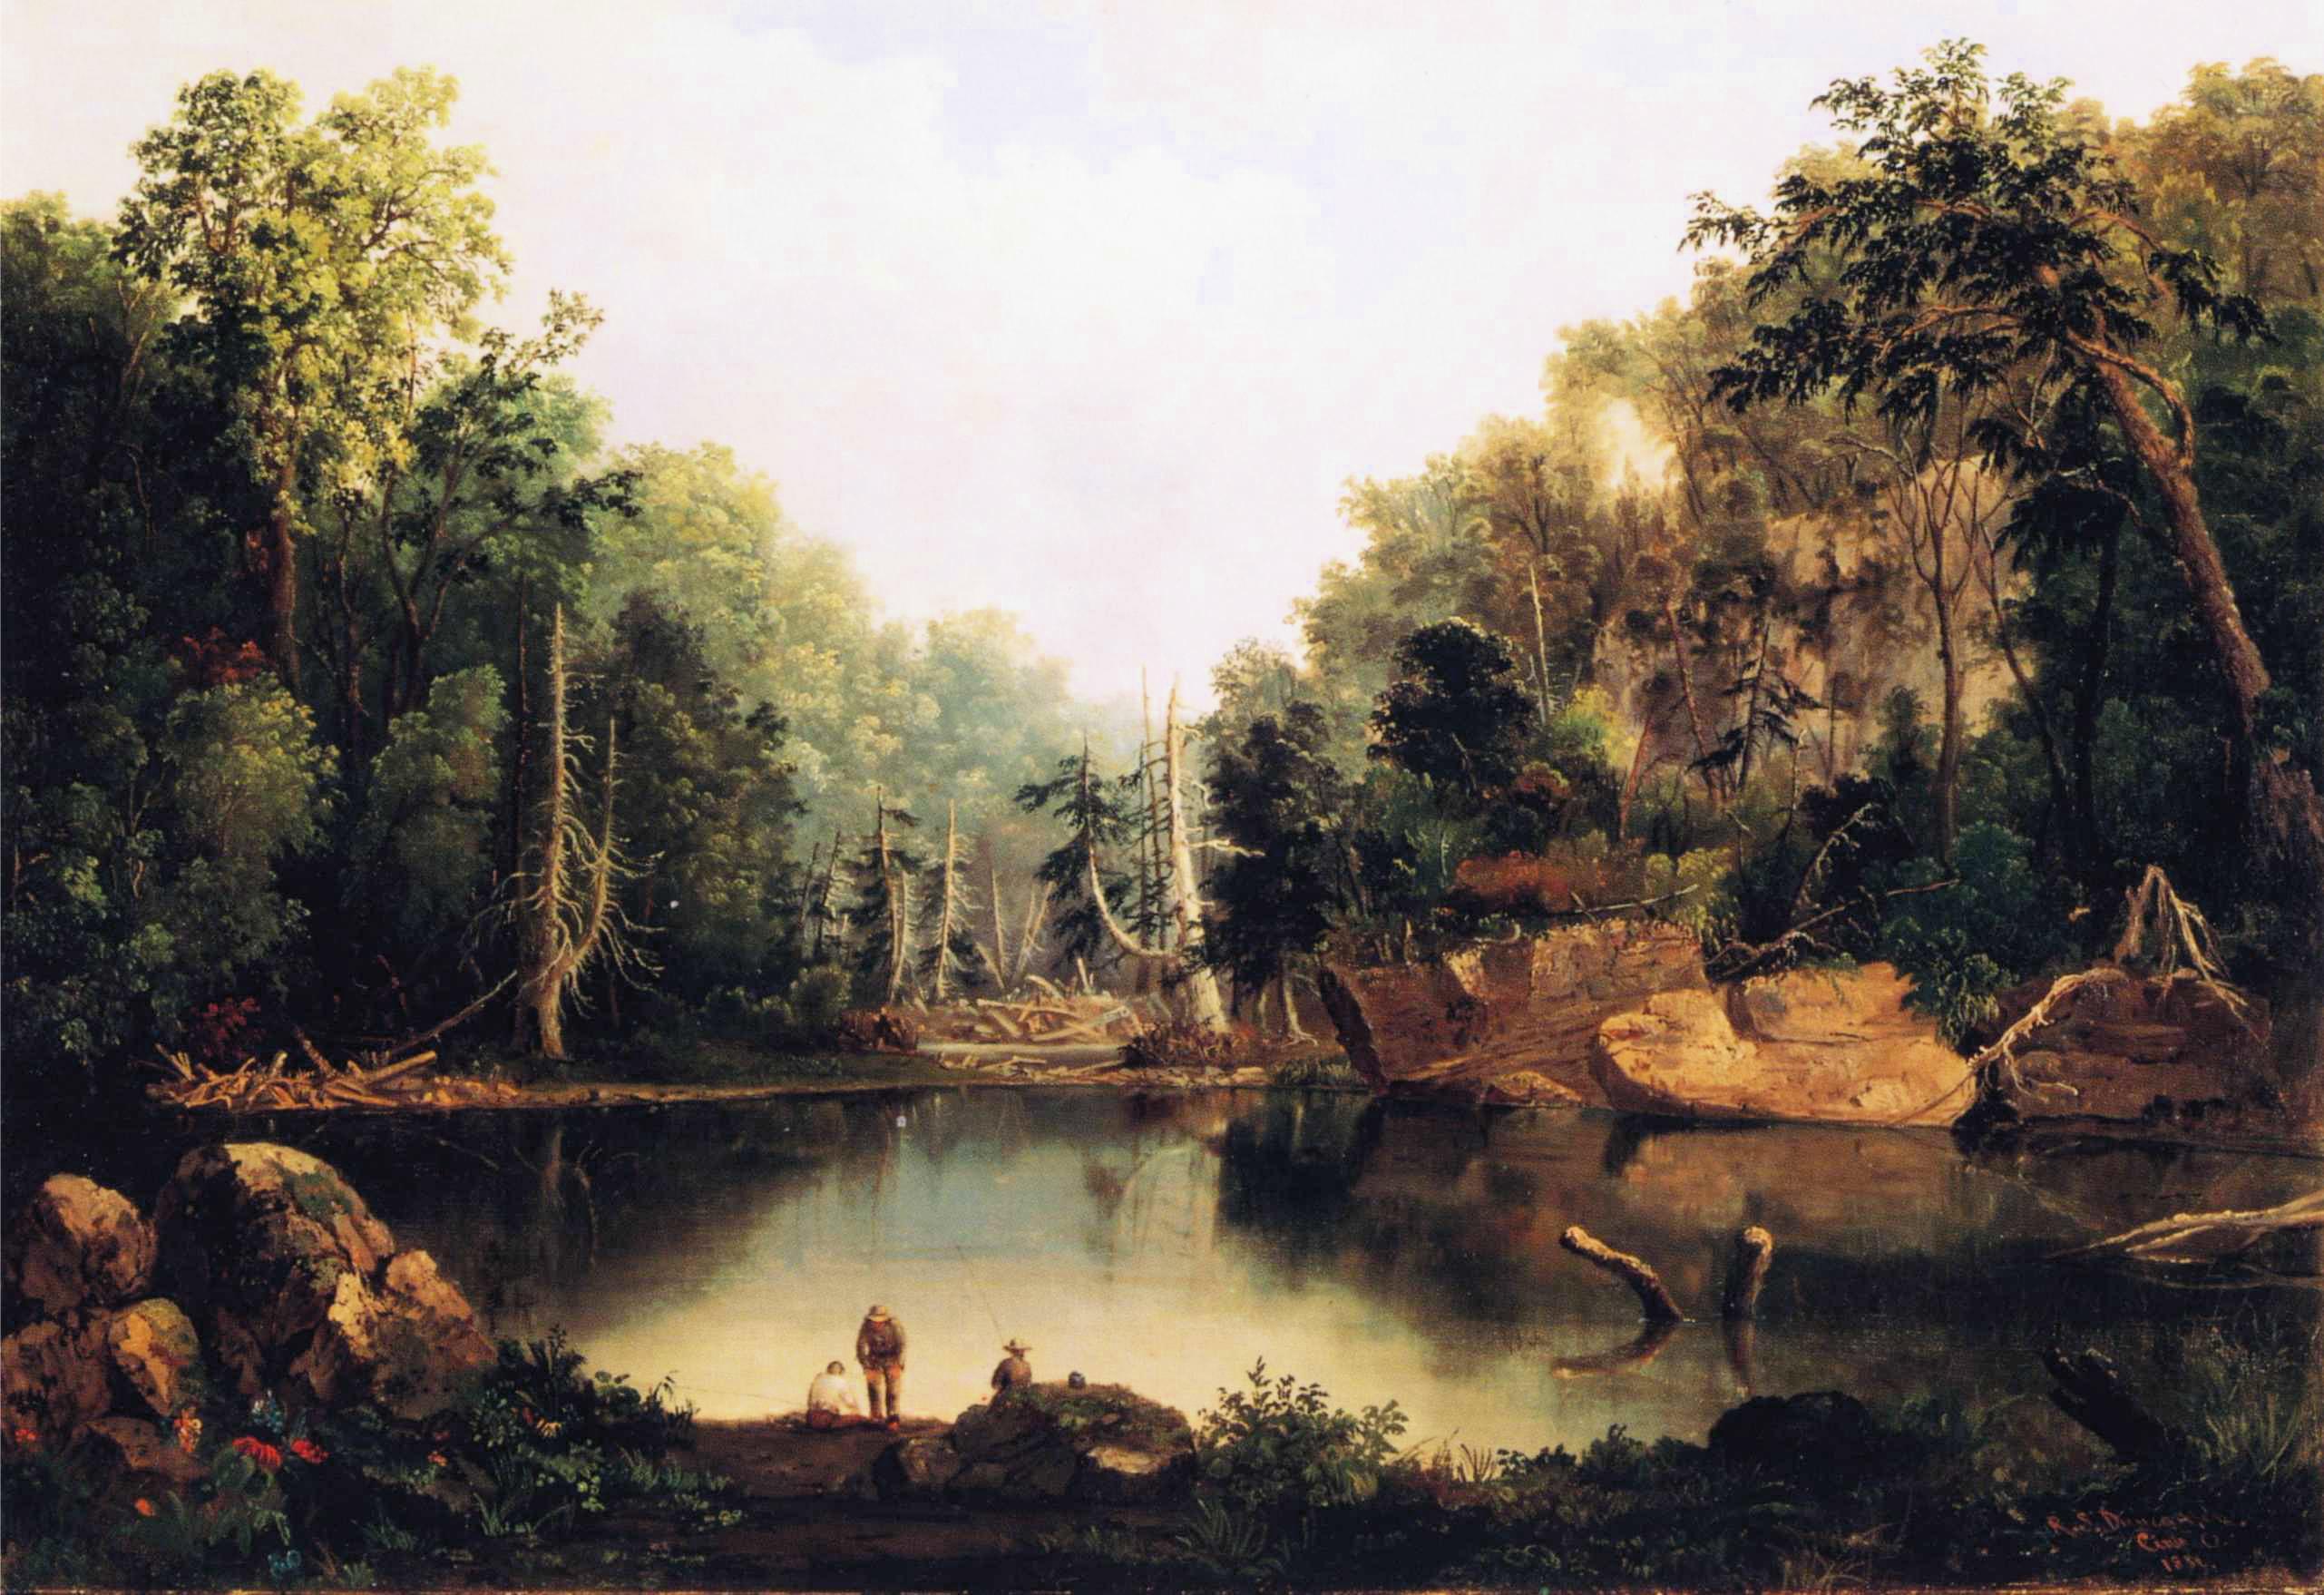 http://upload.wikimedia.org/wikipedia/commons/d/da/Robert_Duncanson_-_Blue_Hole%2C_Little_Miami_River.JPG